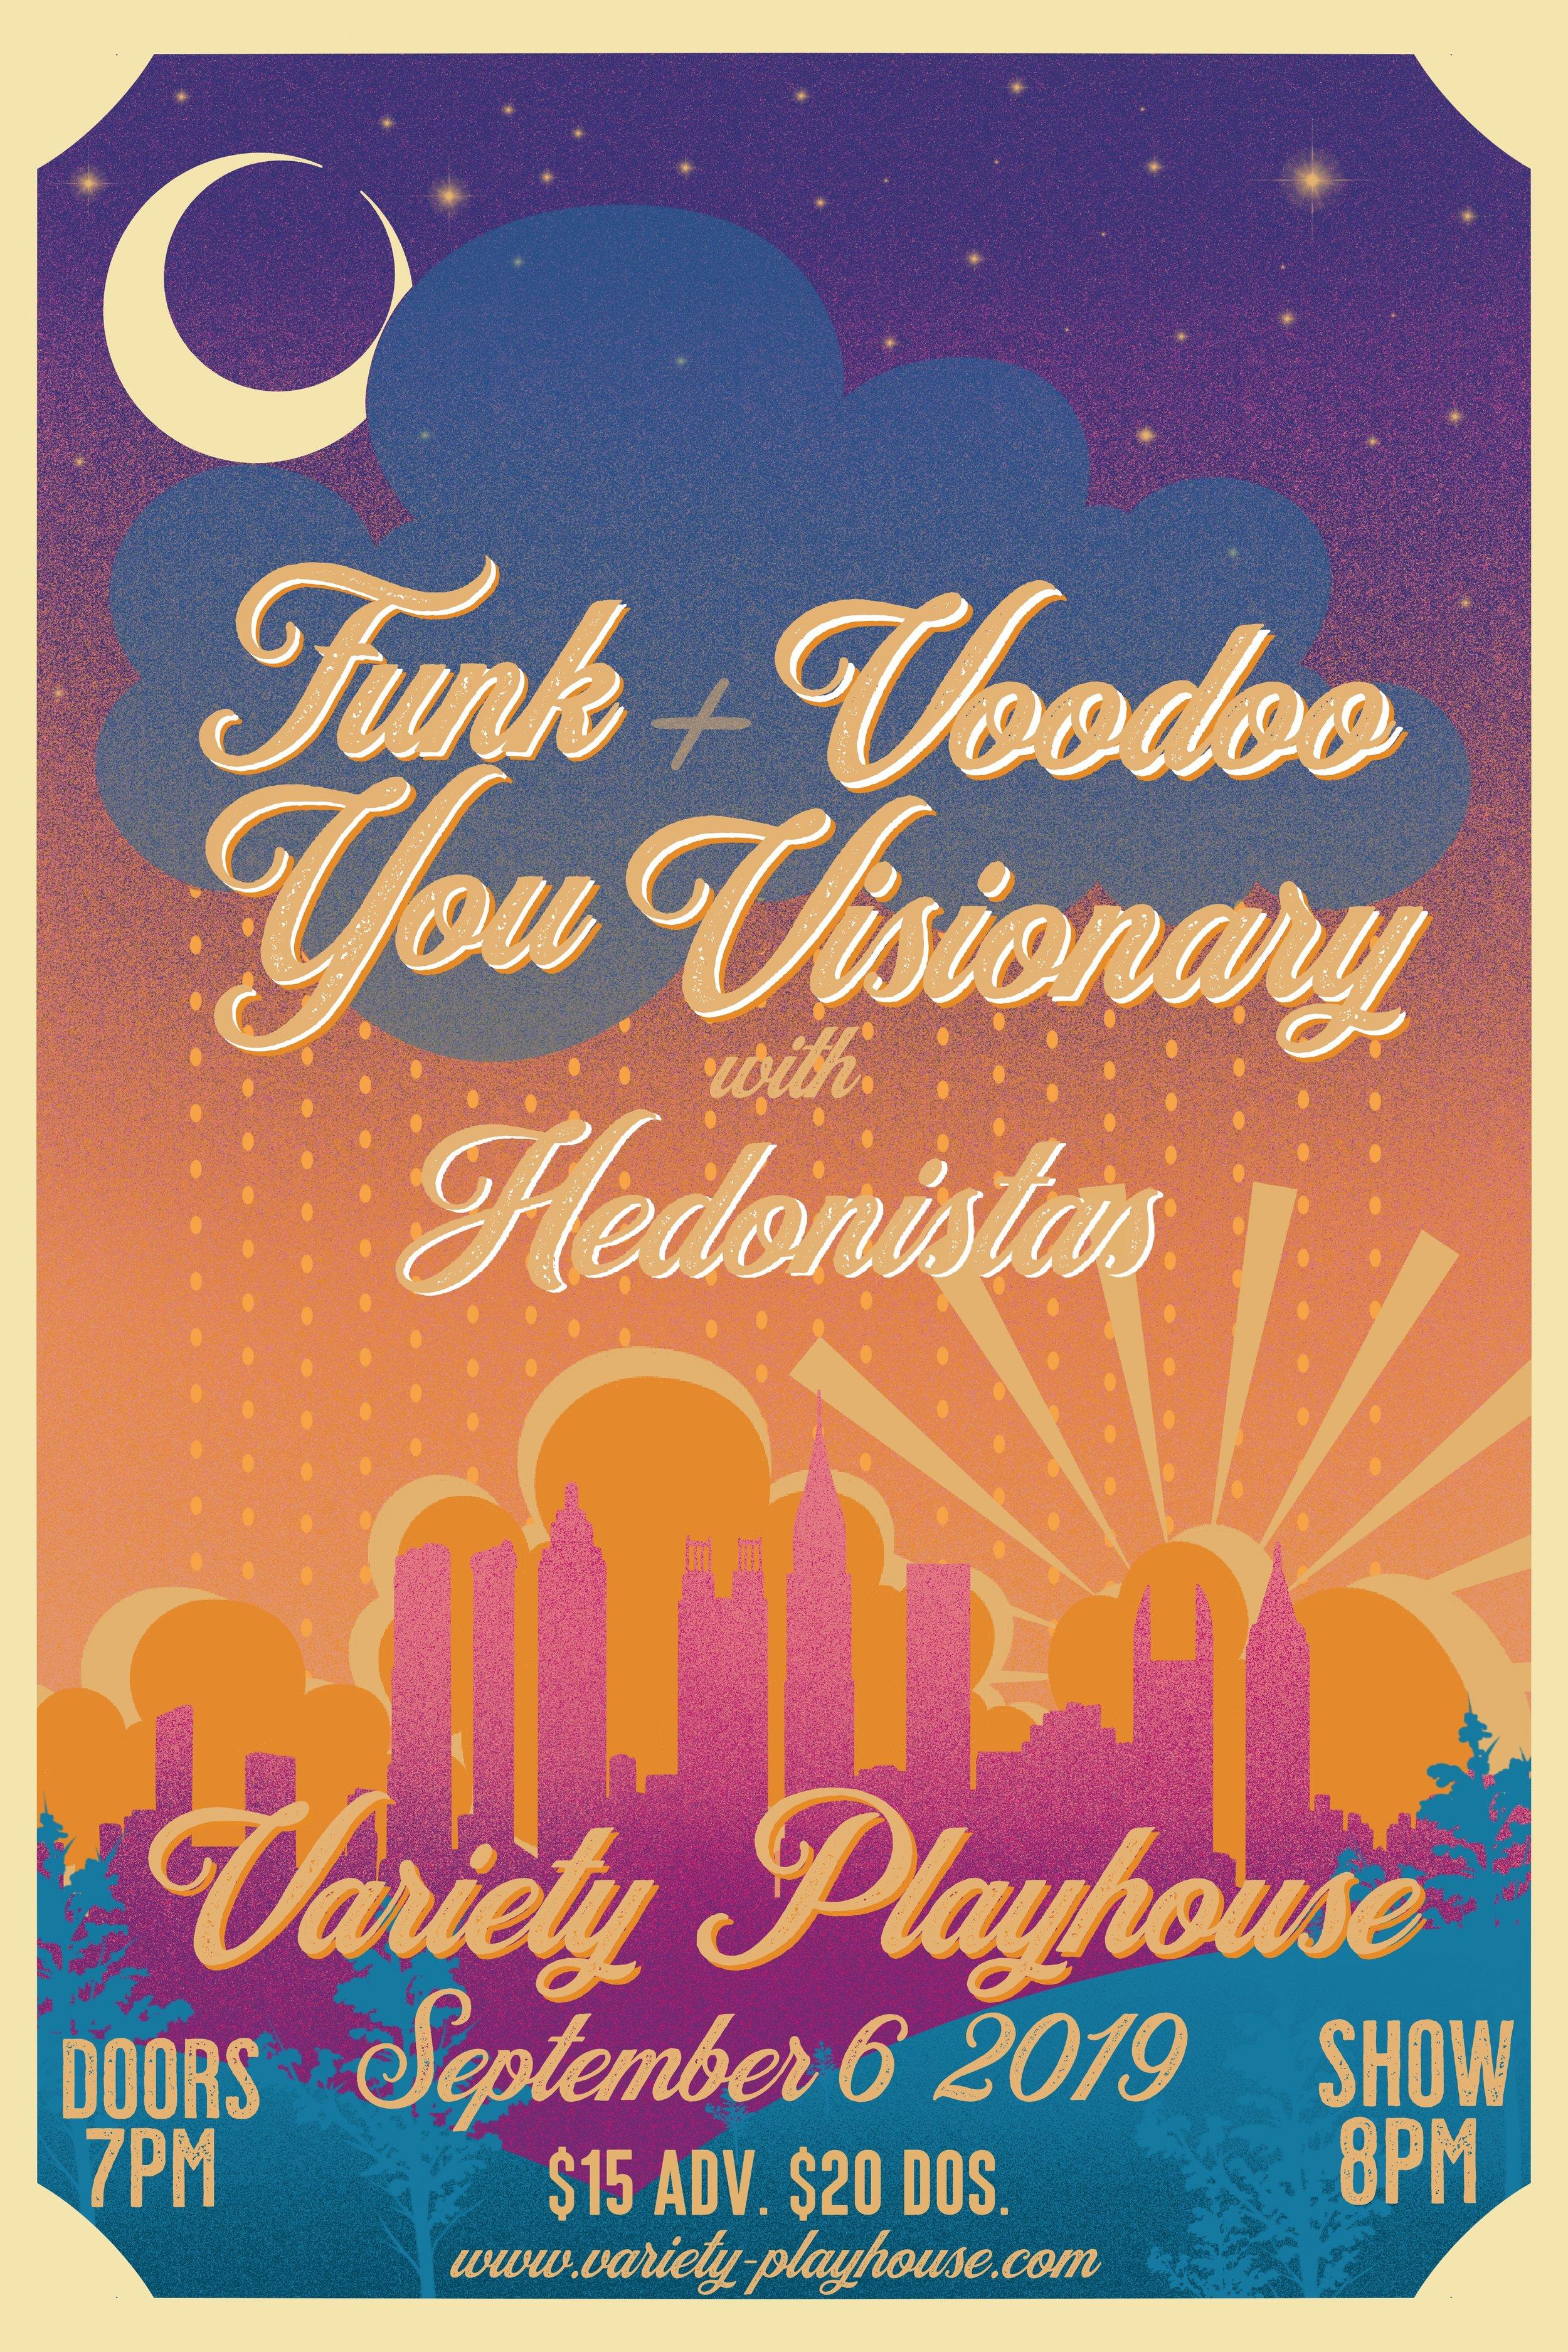 Tickets: http://www.ticketfly.com/event/1868286-funk-you-voodoo-visionary-atlanta/?utm_medium=459899